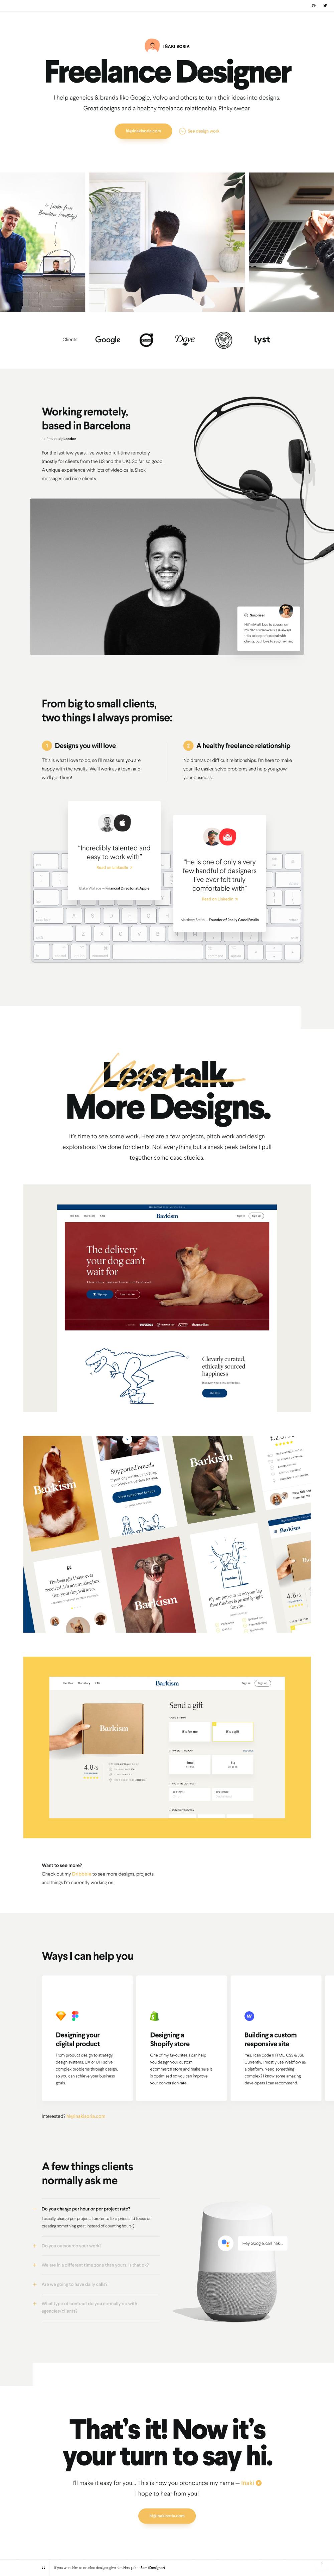 Wonderful One Page portfolio for designer Iñaki Soria featuring